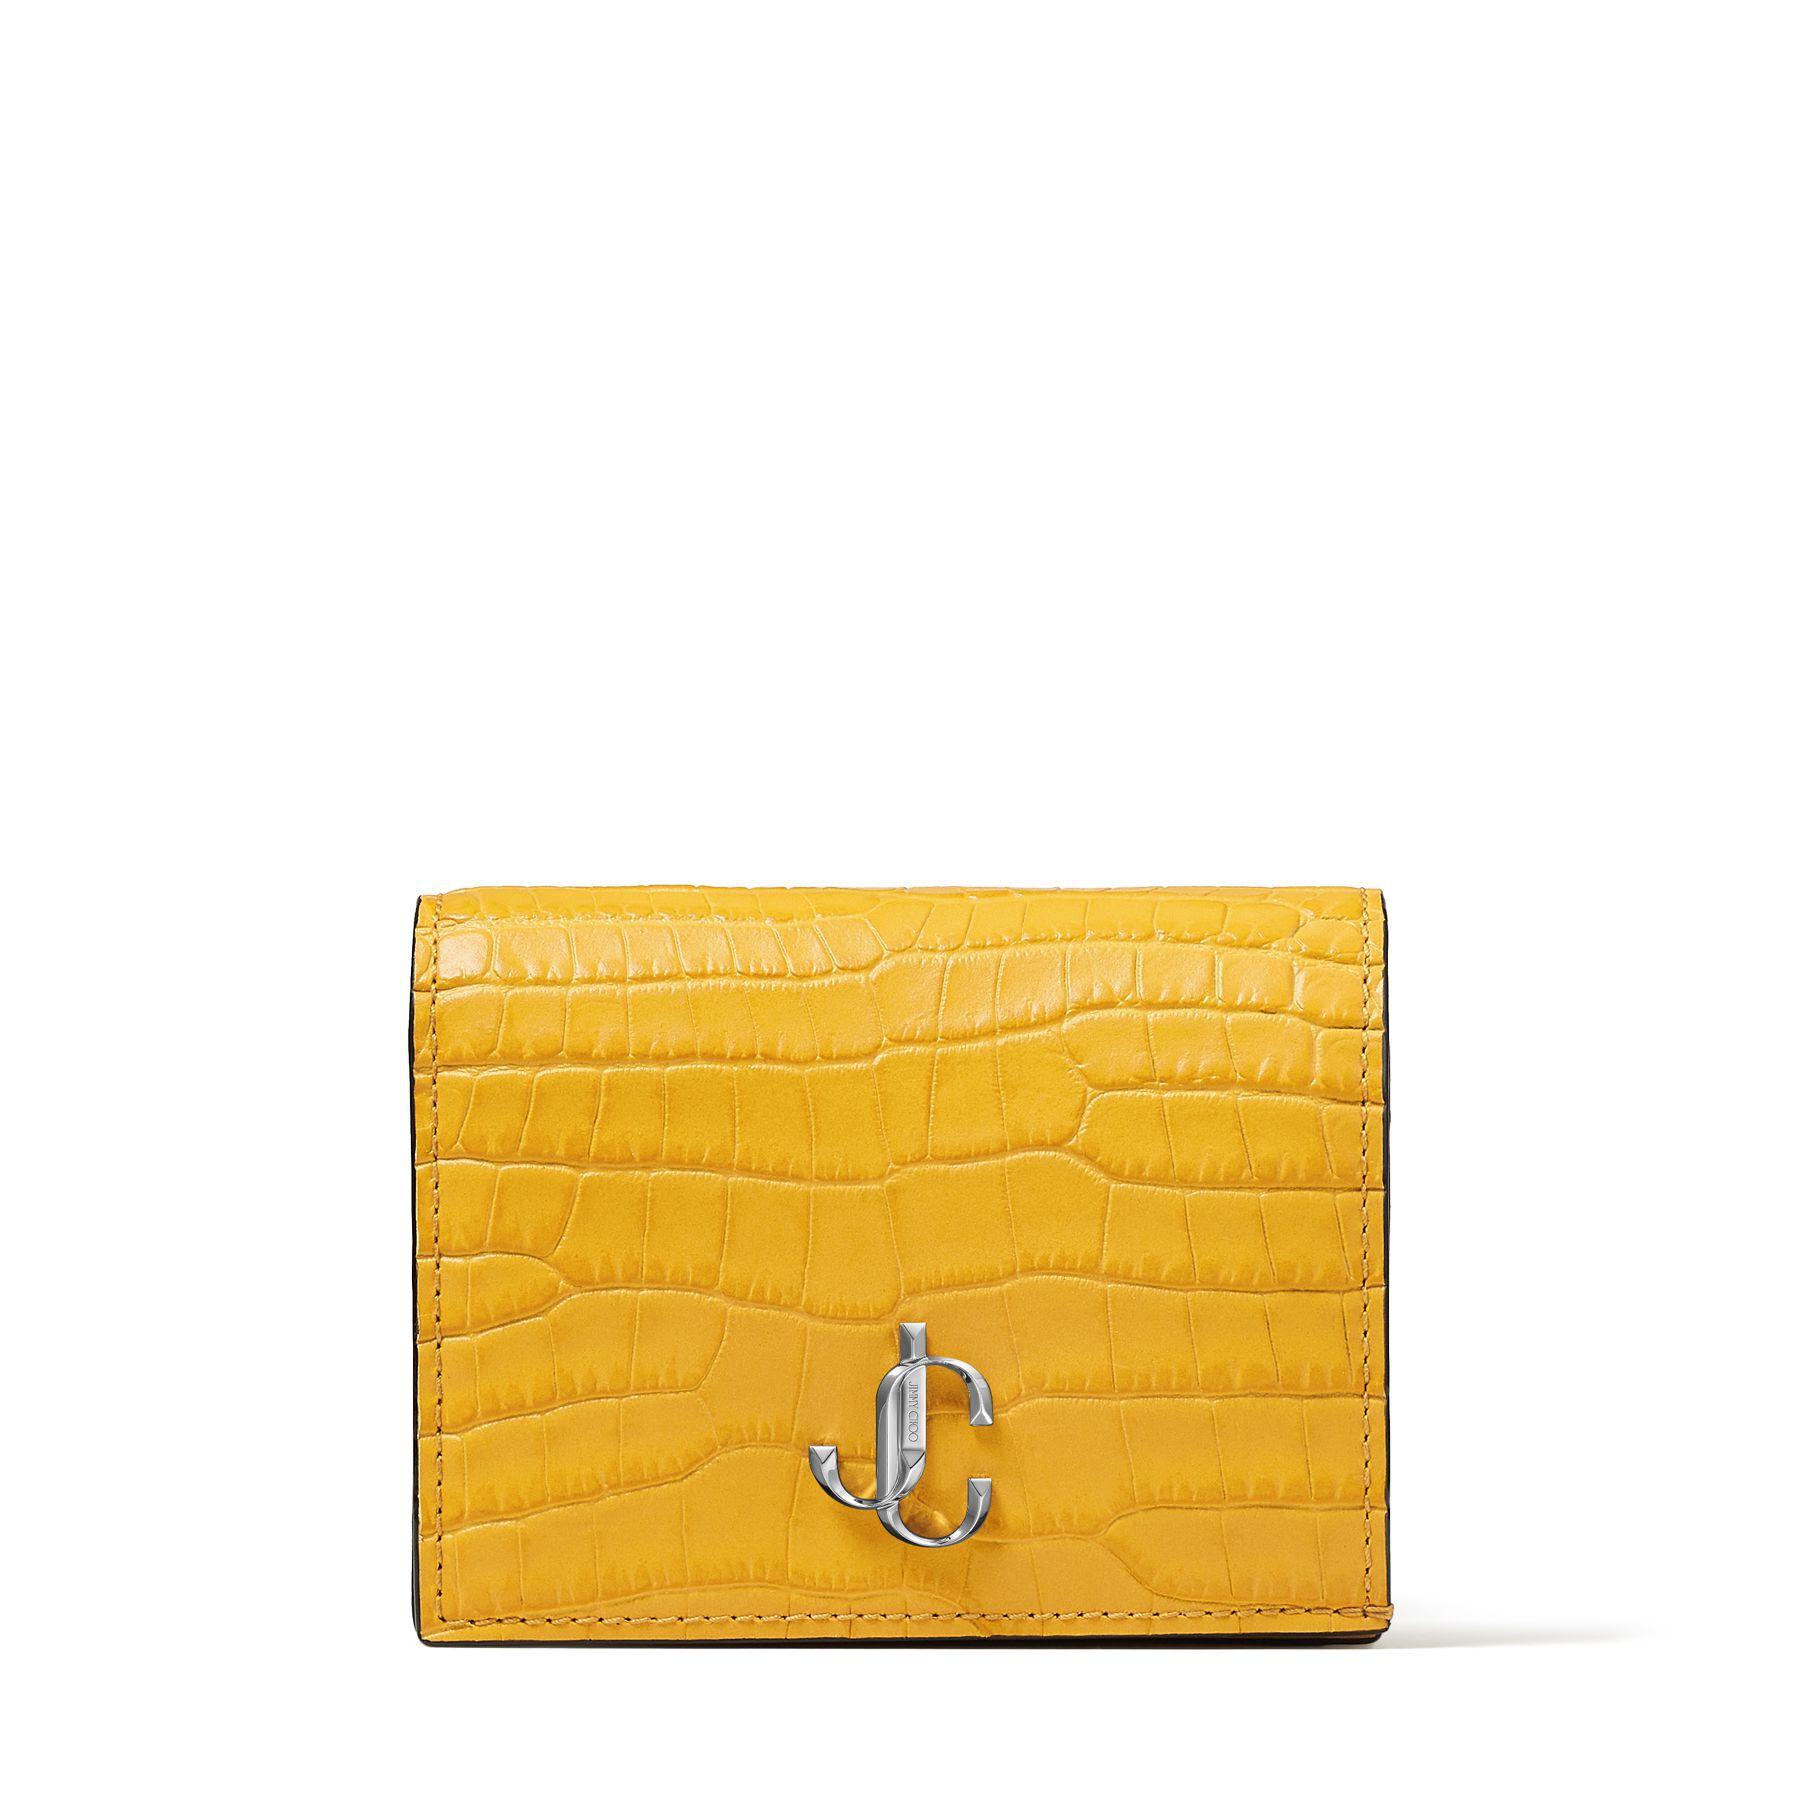 HANNE - Dark Sun Croc-Embossed Leather Wallet with Silver JC Emblem